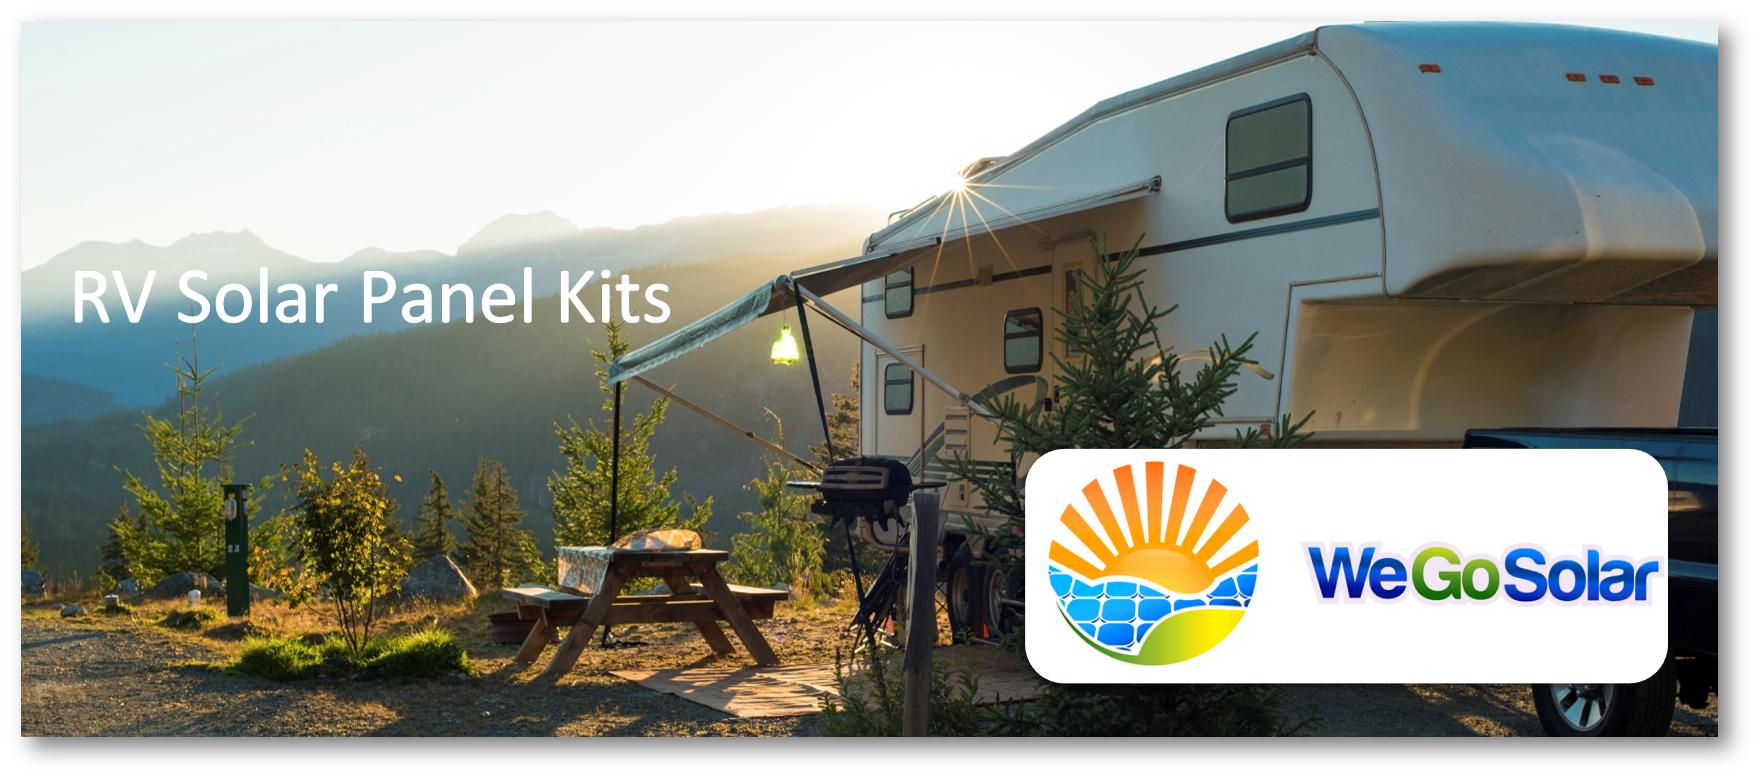 solar-panel-rv-kits-vancouver-island-bc-canada-cowichan.jpg